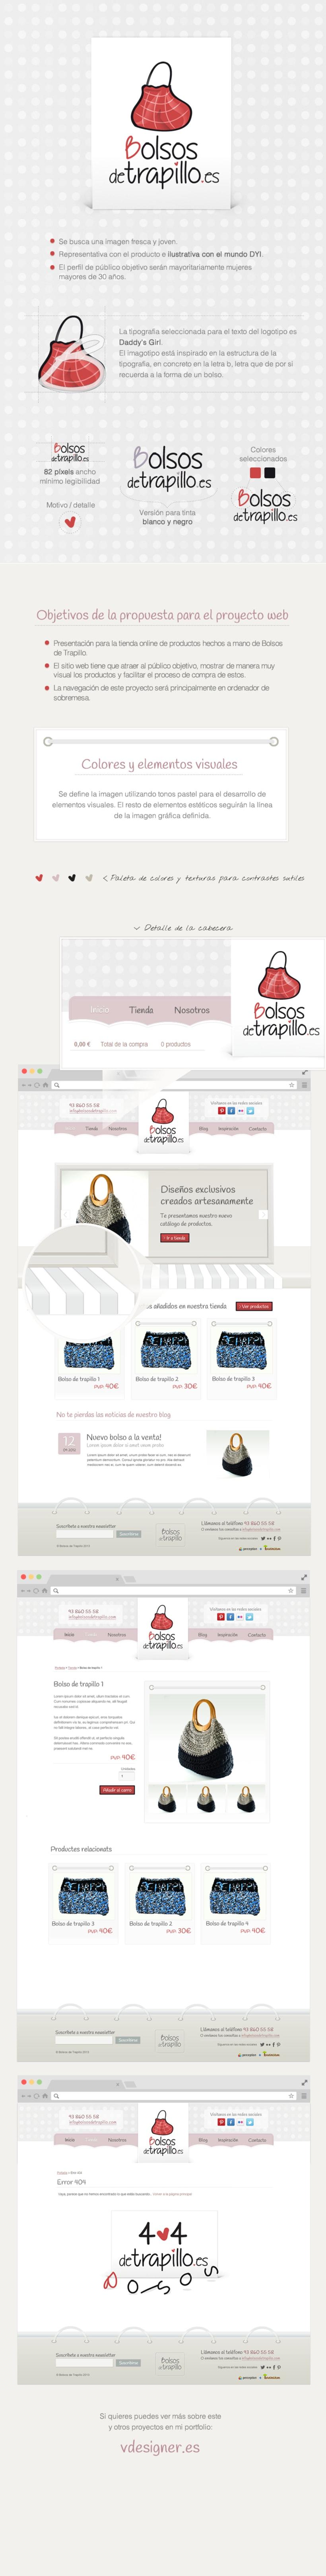 Bolsos de Trapillo, un proyecto de venta de bolsos DIY 0